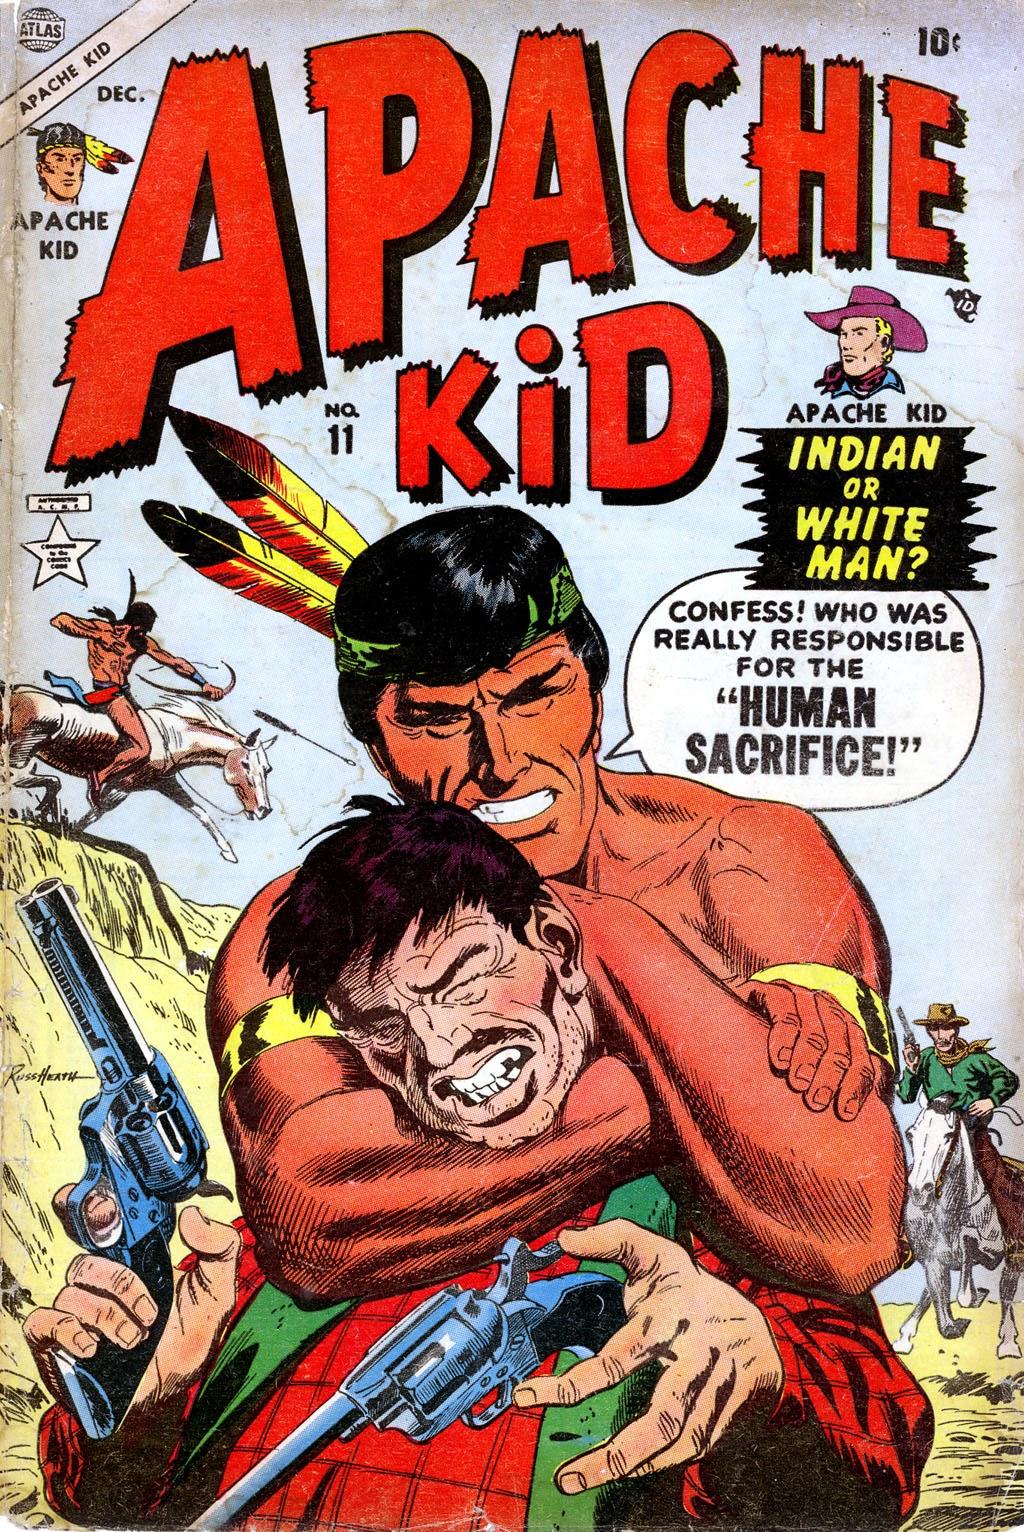 Apache Kid 11 Page 1